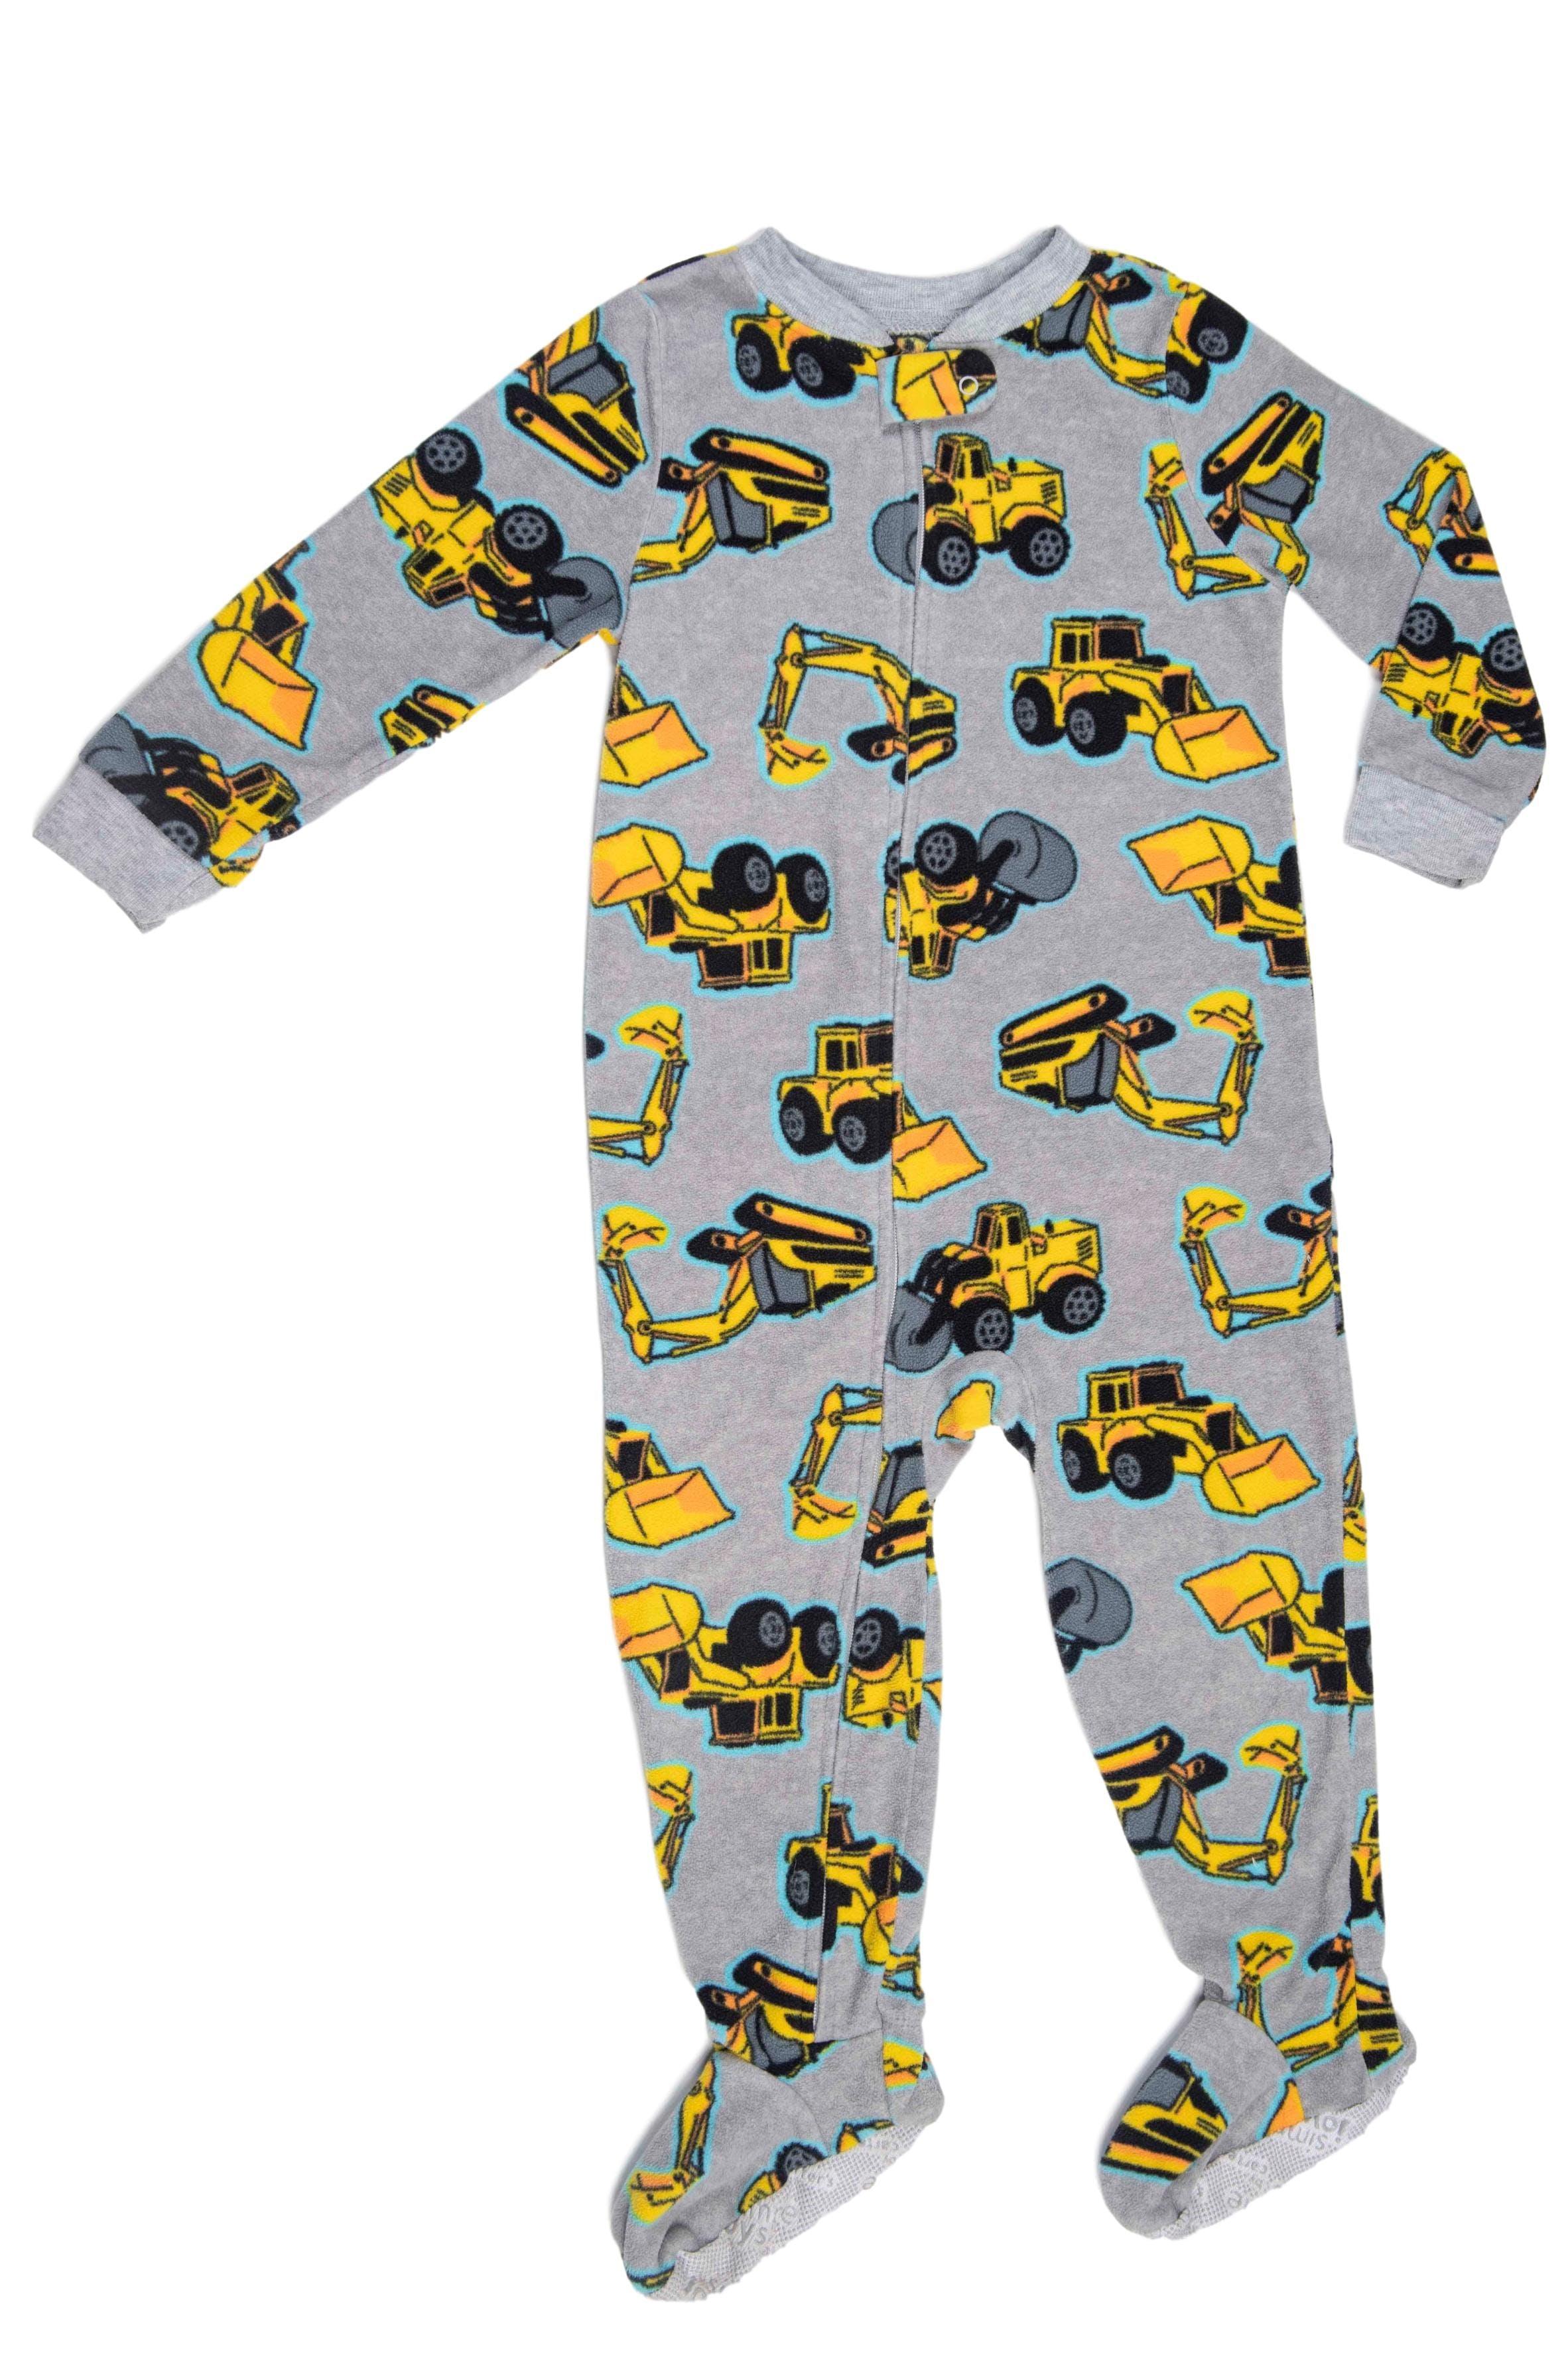 Pijama de polar ploma con tractores, suela antideslizante - Carter's